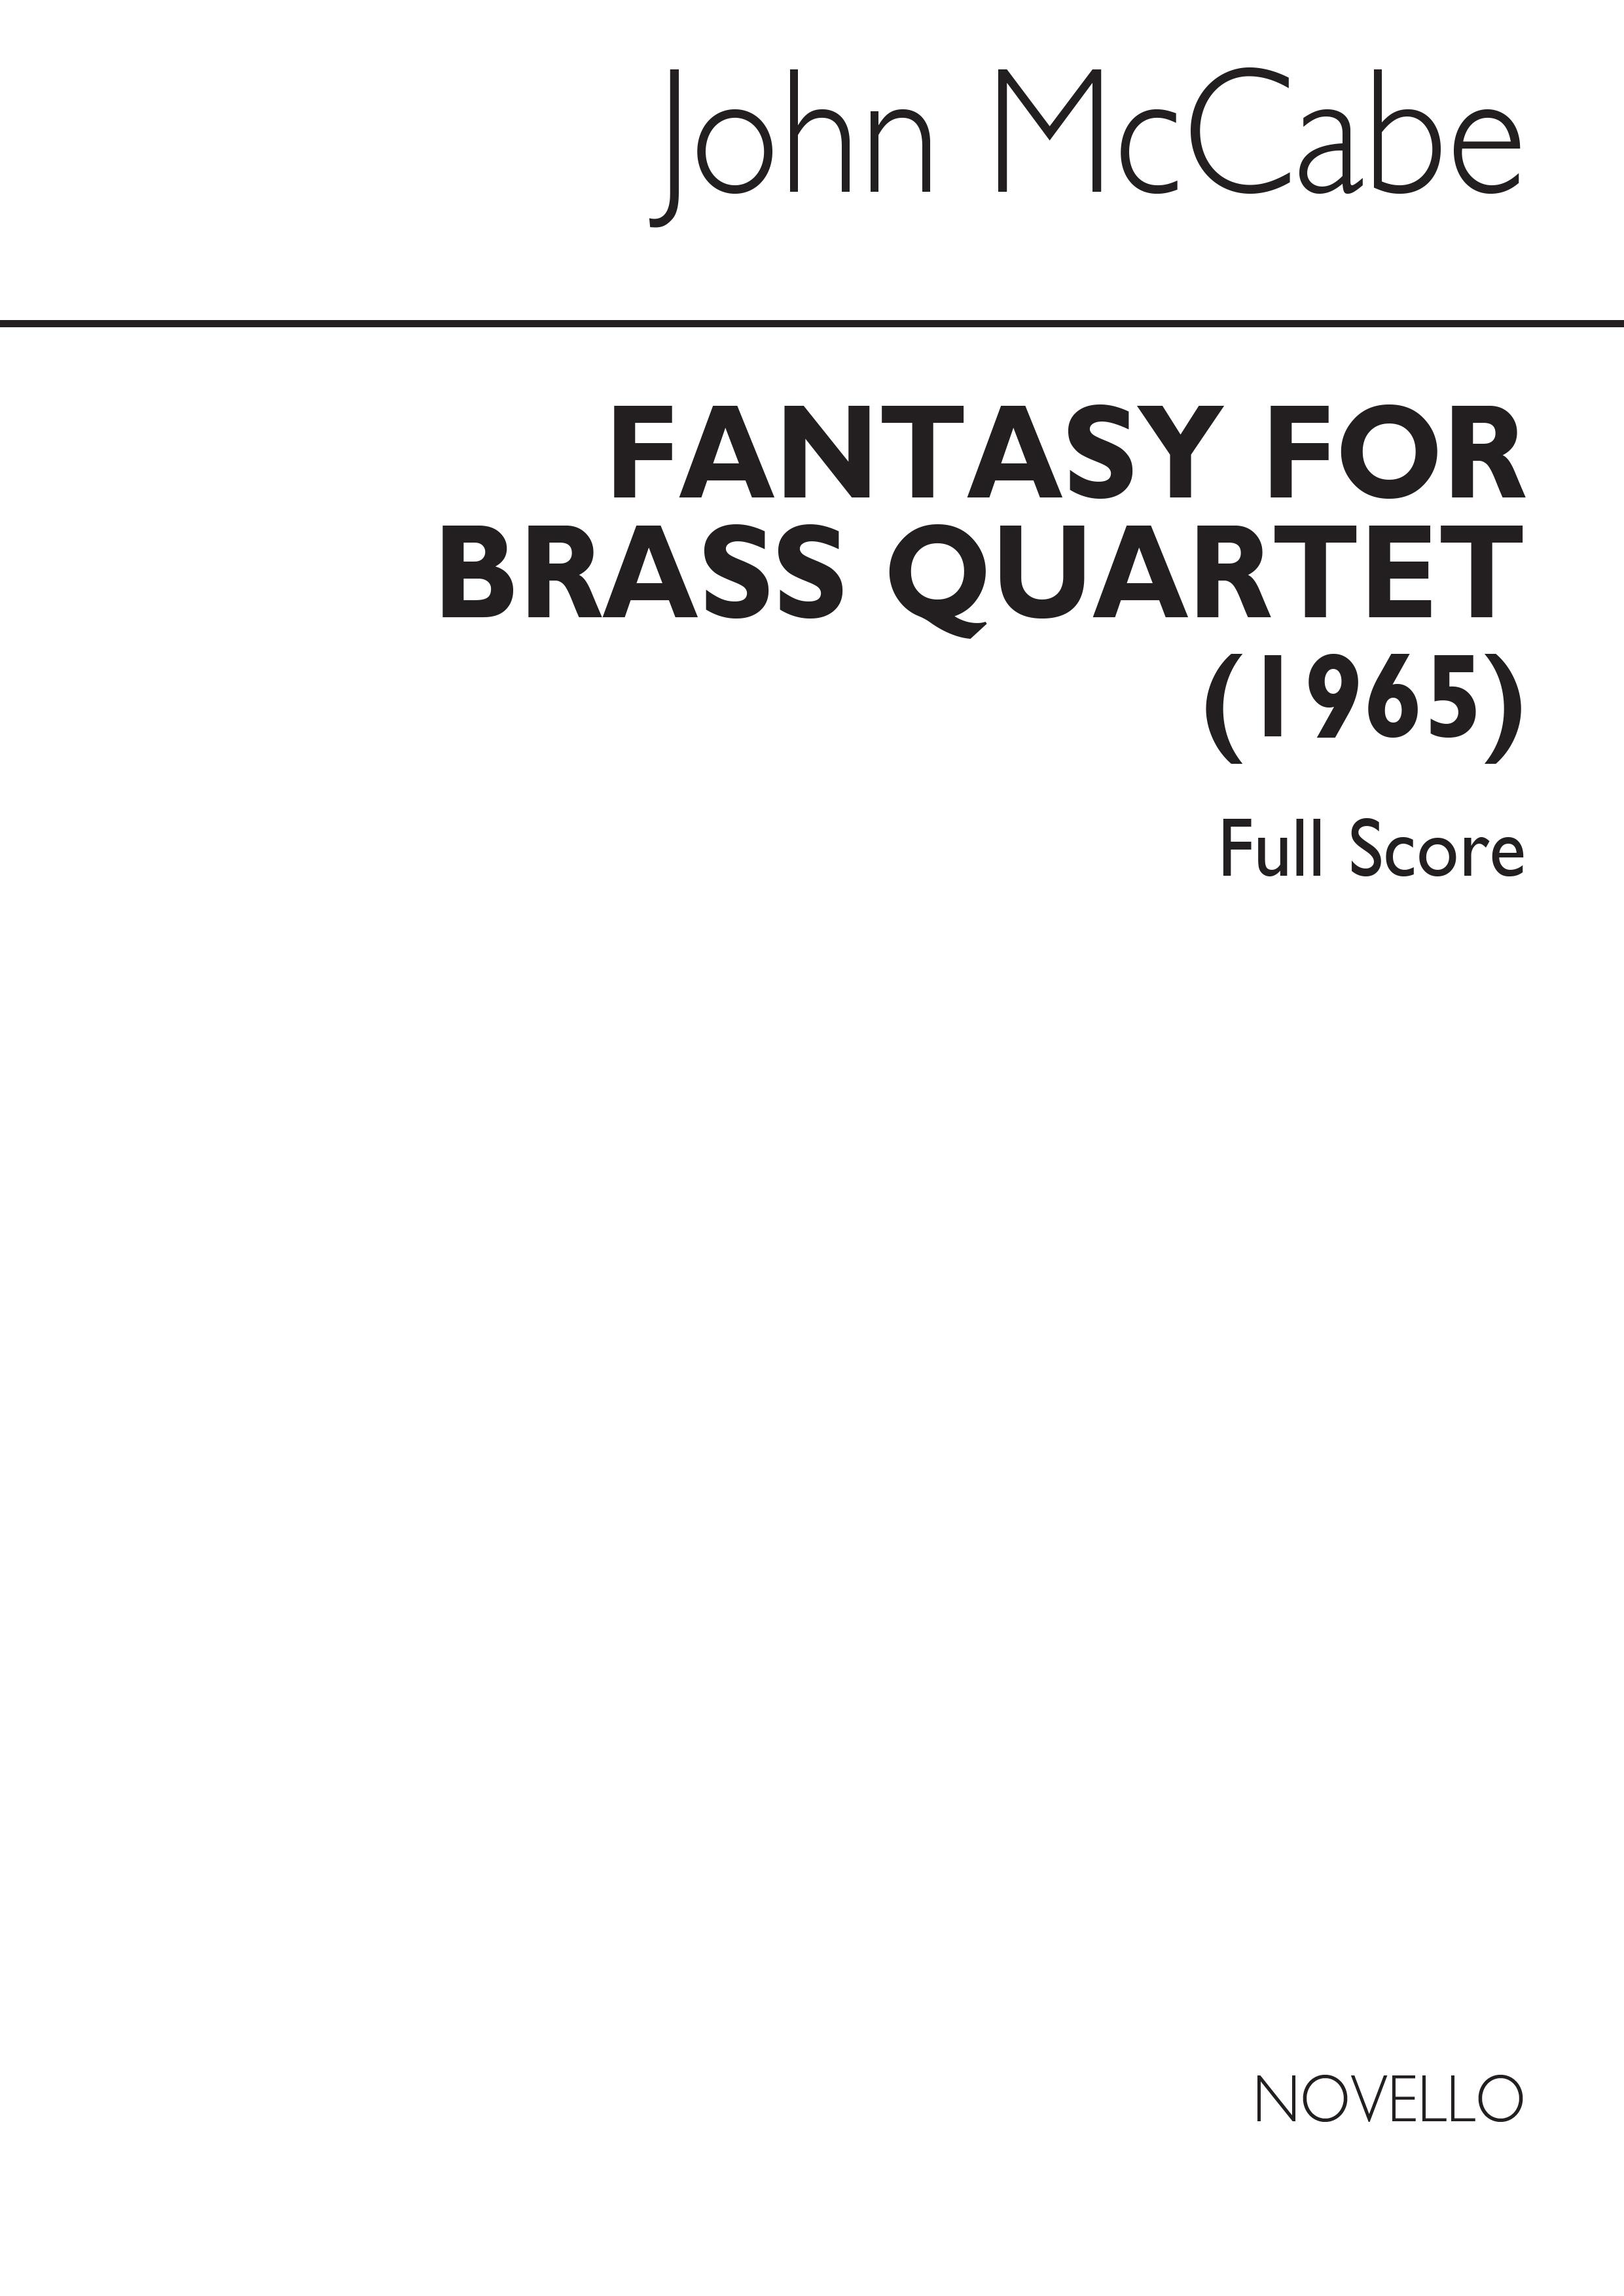 John McCabe: John McCabe: Fantasy For Brass Quartet Op.35: Brass Ensemble: Score